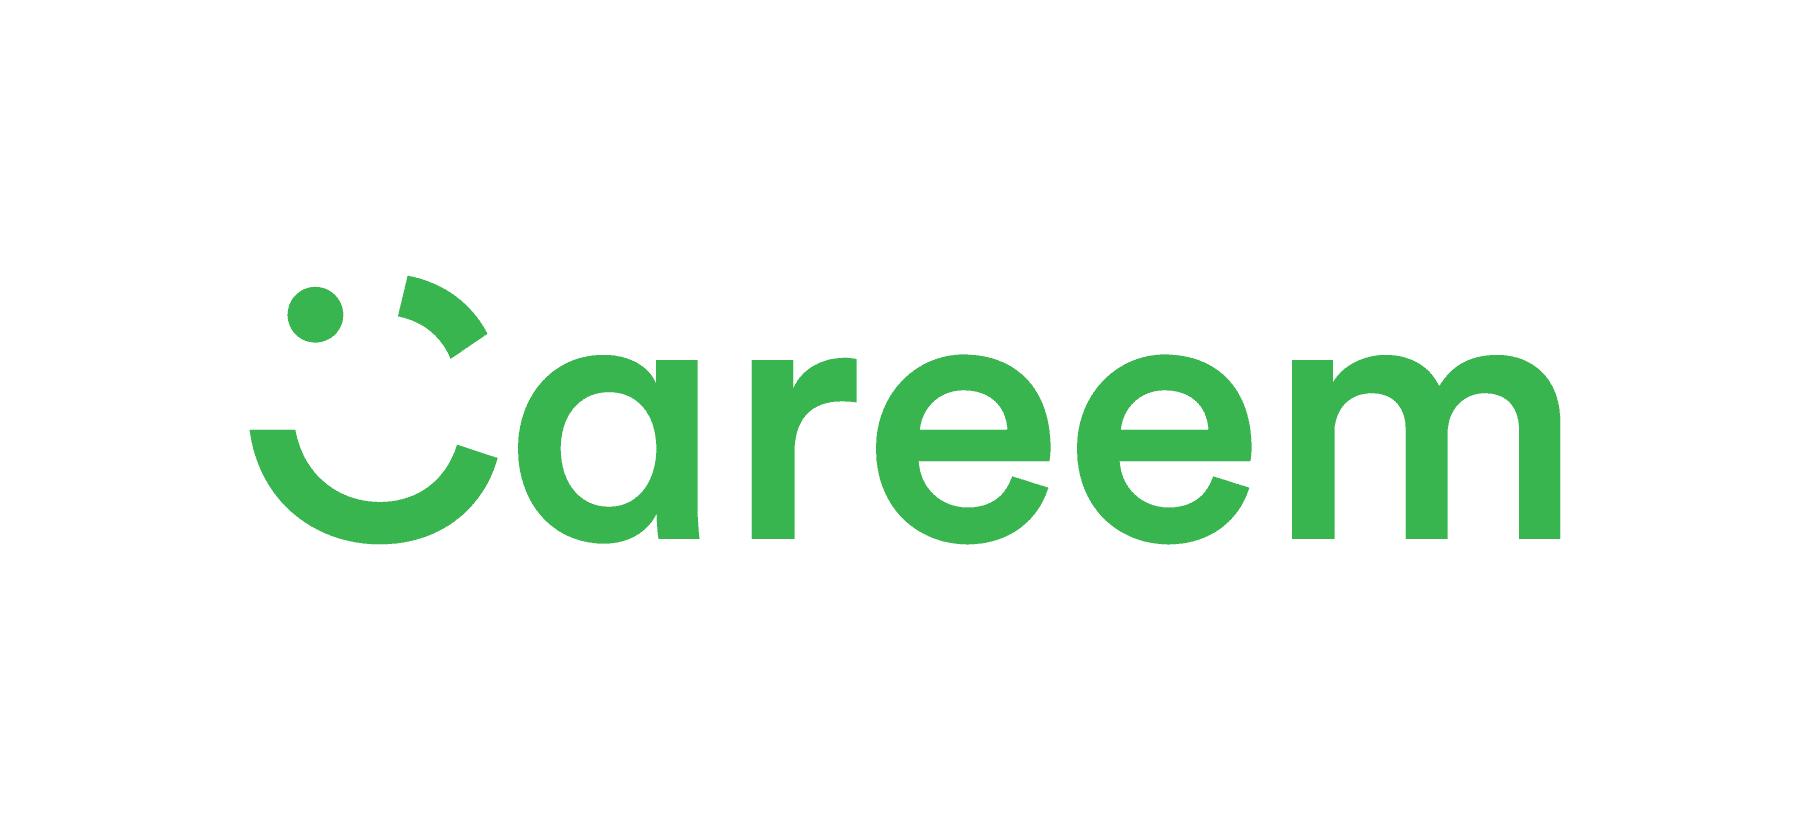 careem statistics